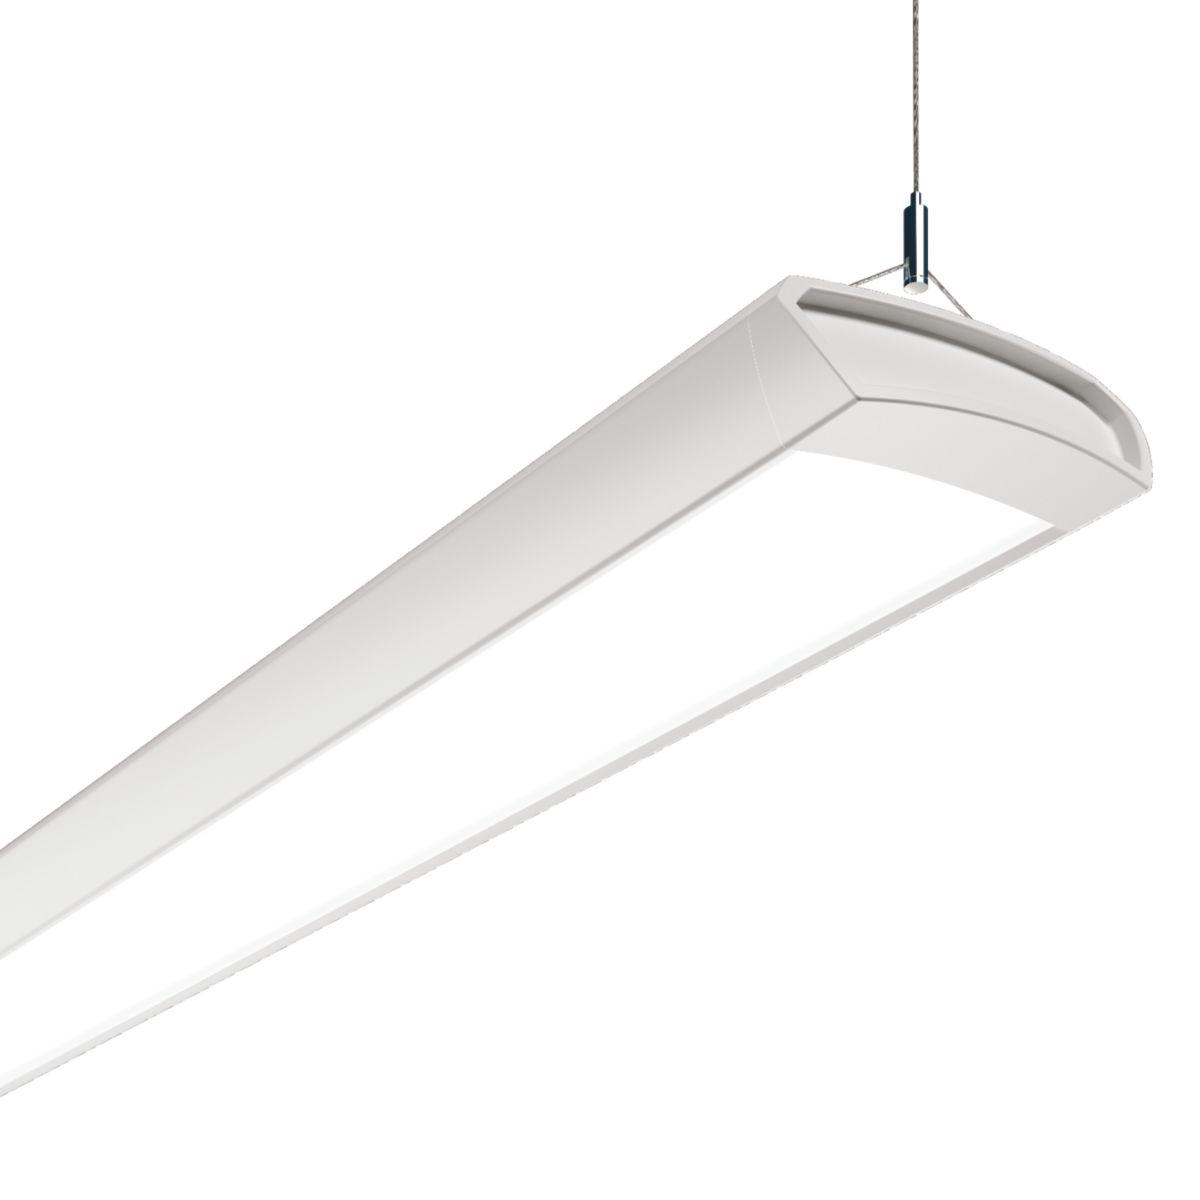 Continua Suspended LED